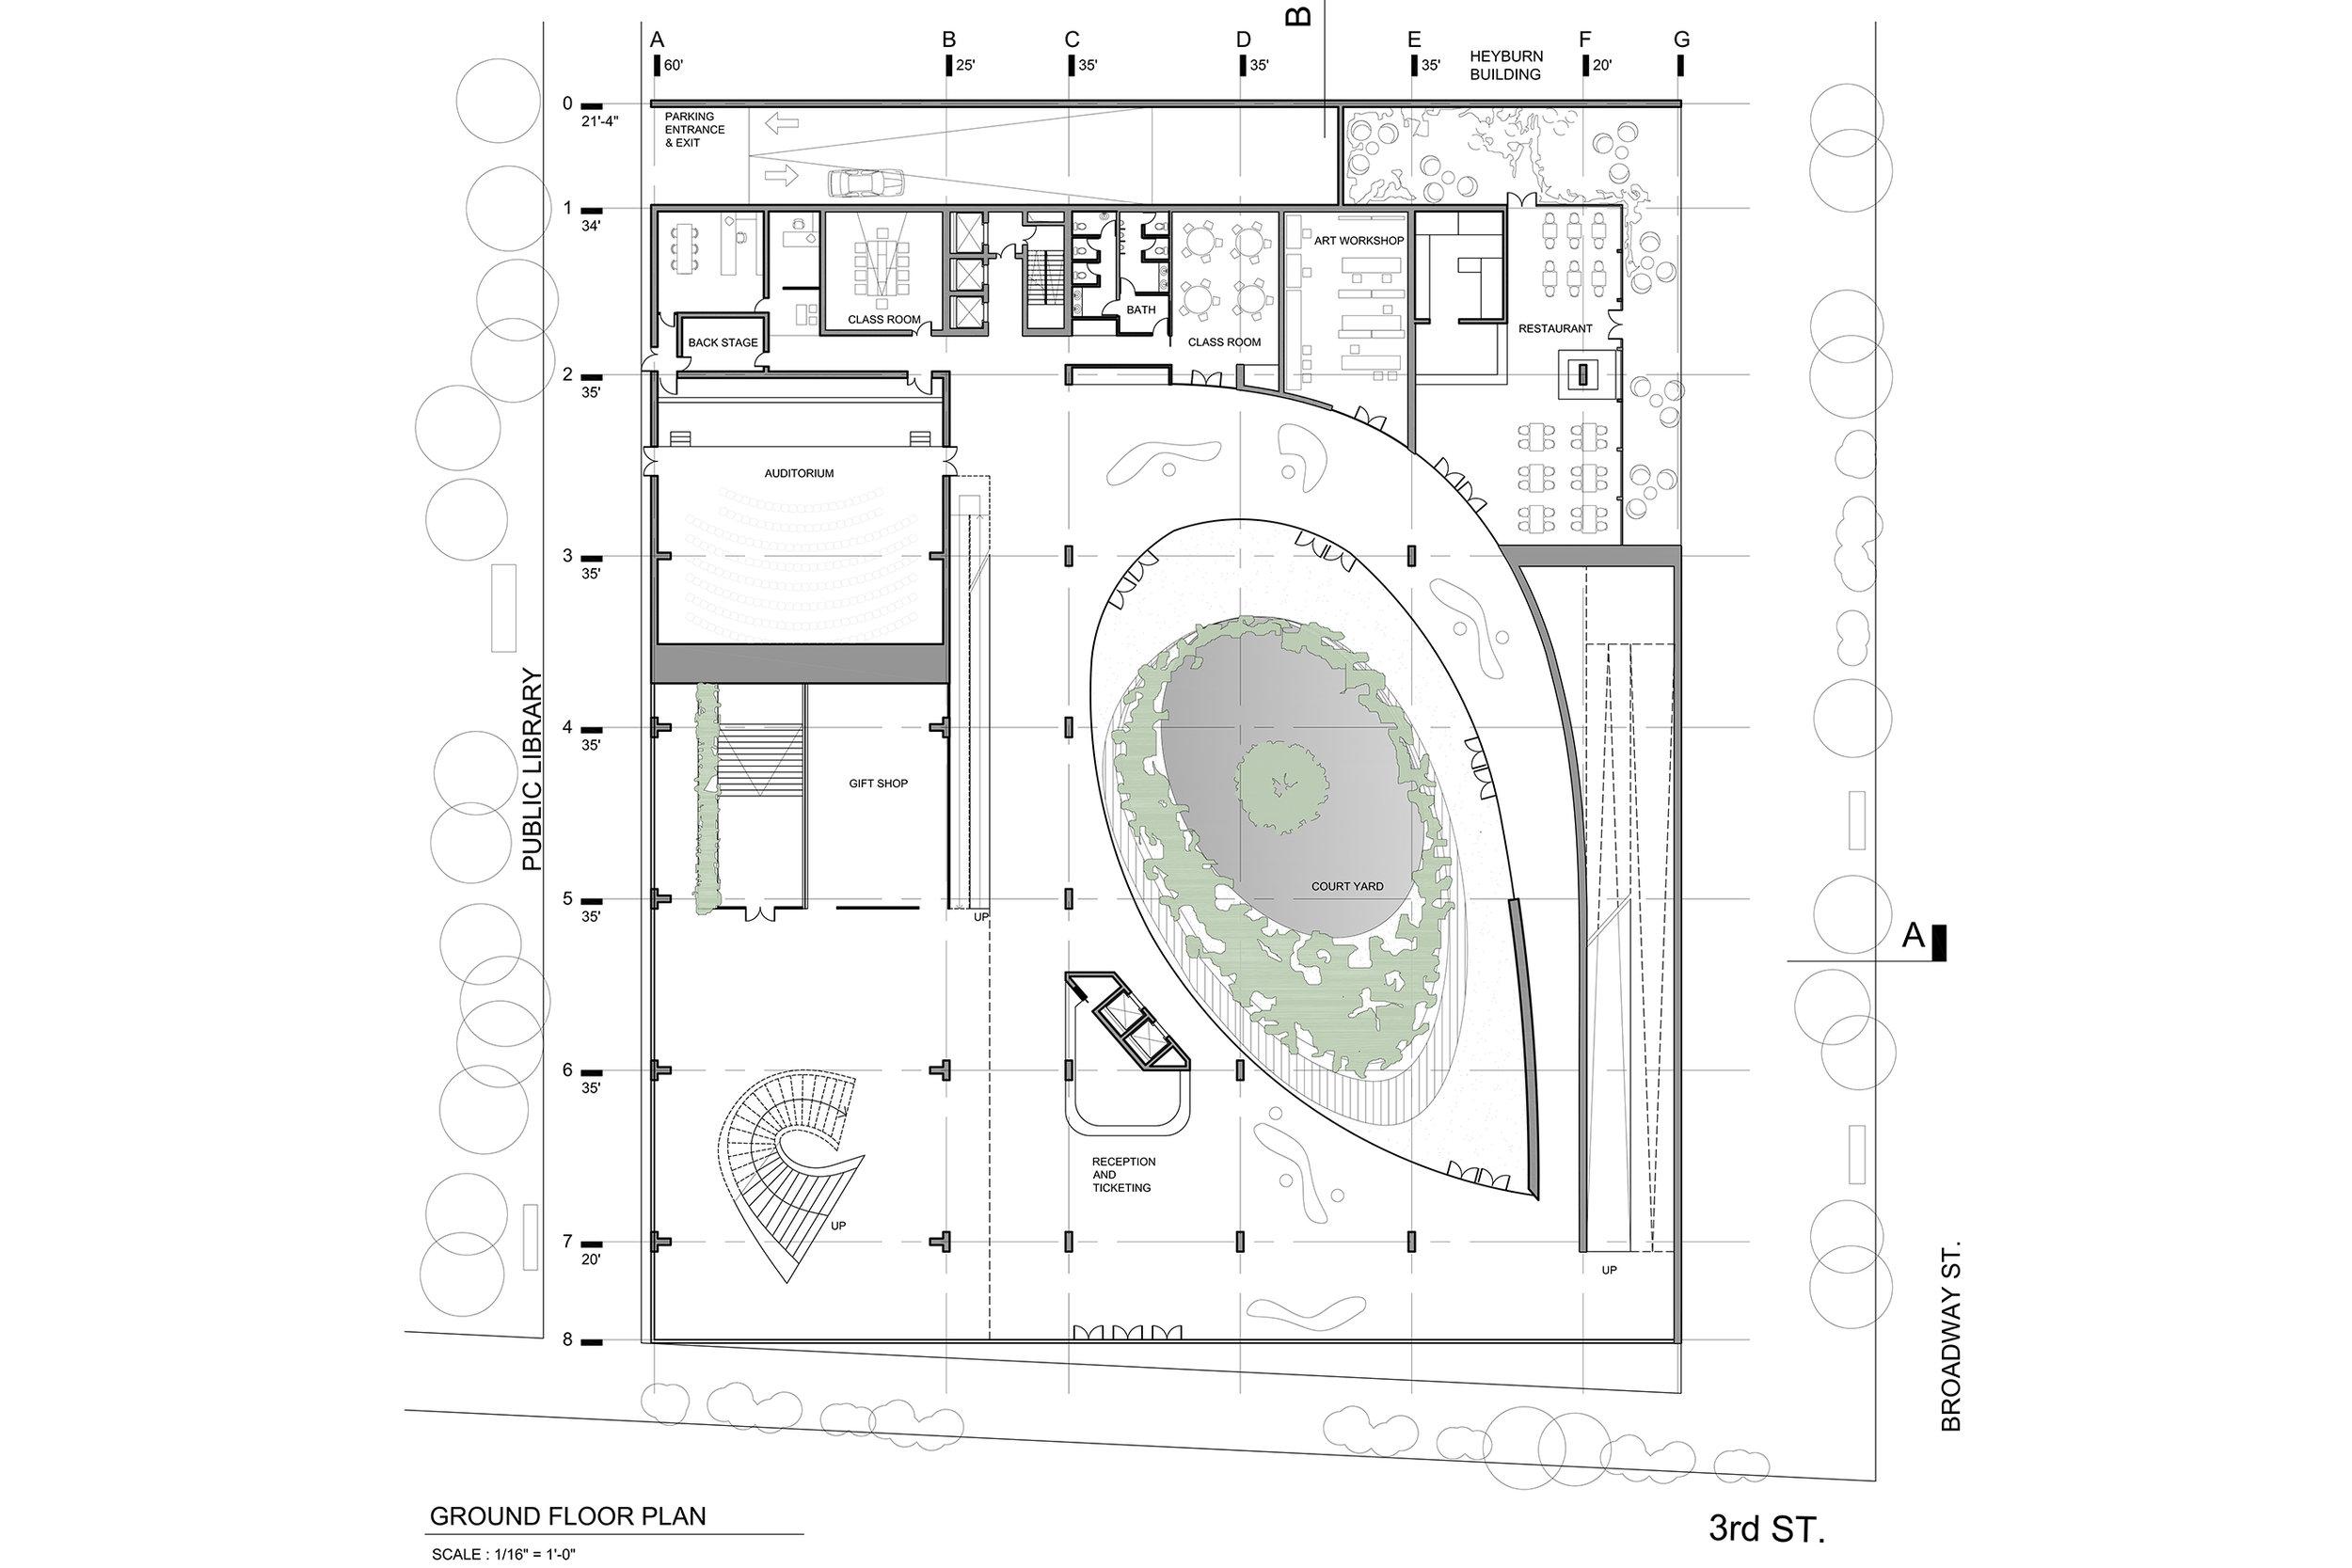 02 Hadilou Architecture_Ground Floor LCM.jpg